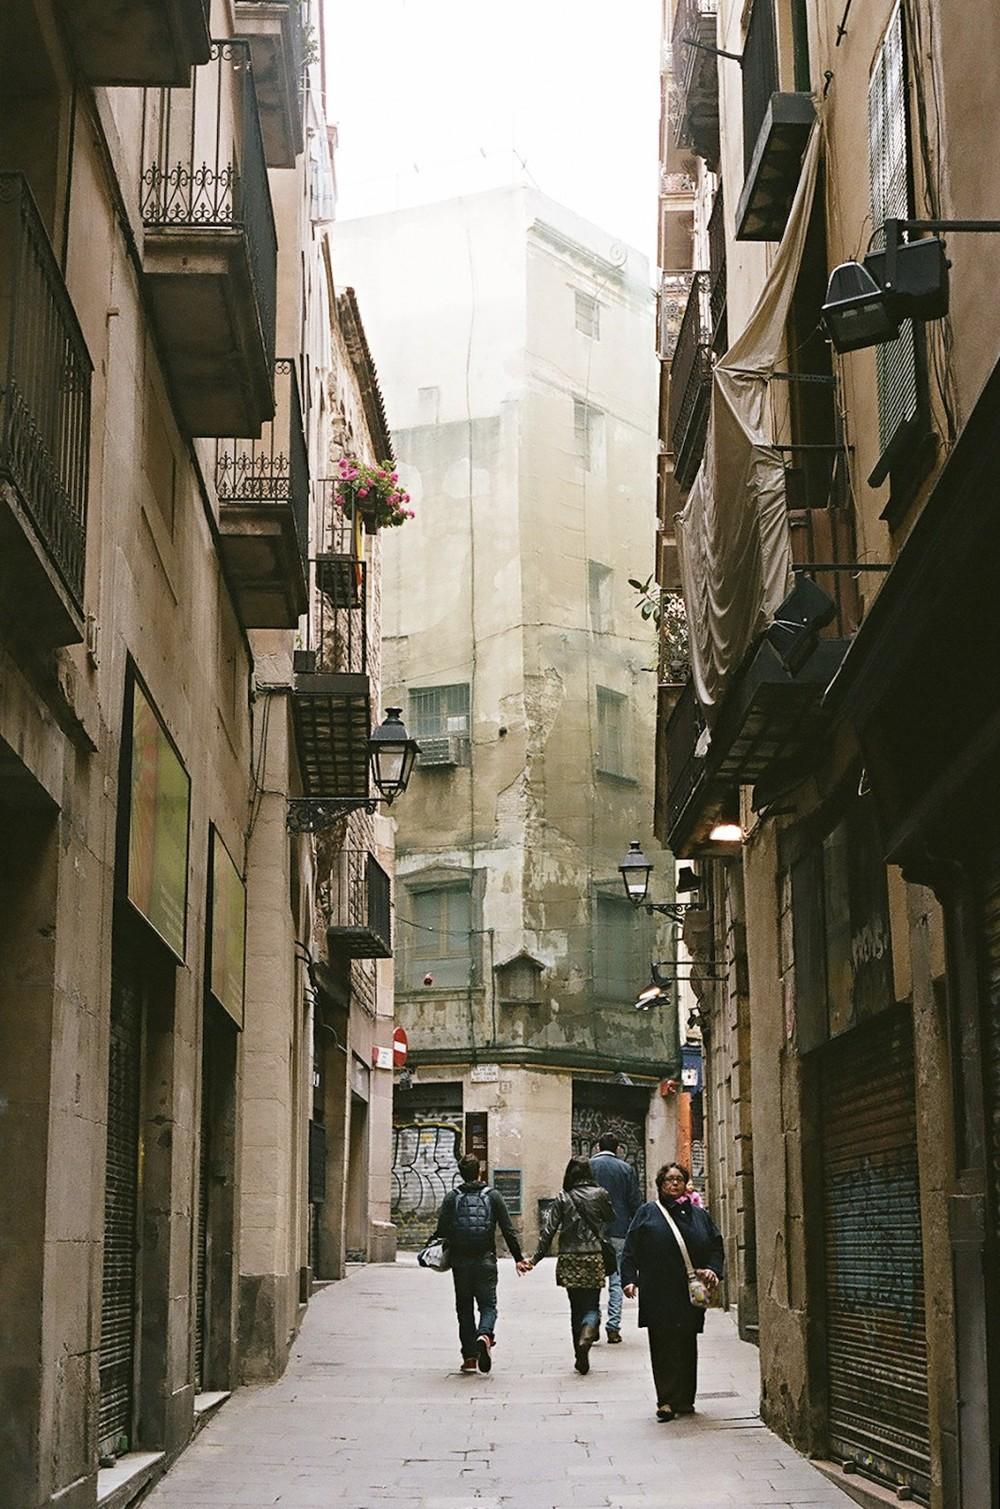 Barcelona-015,xlarge.JPG